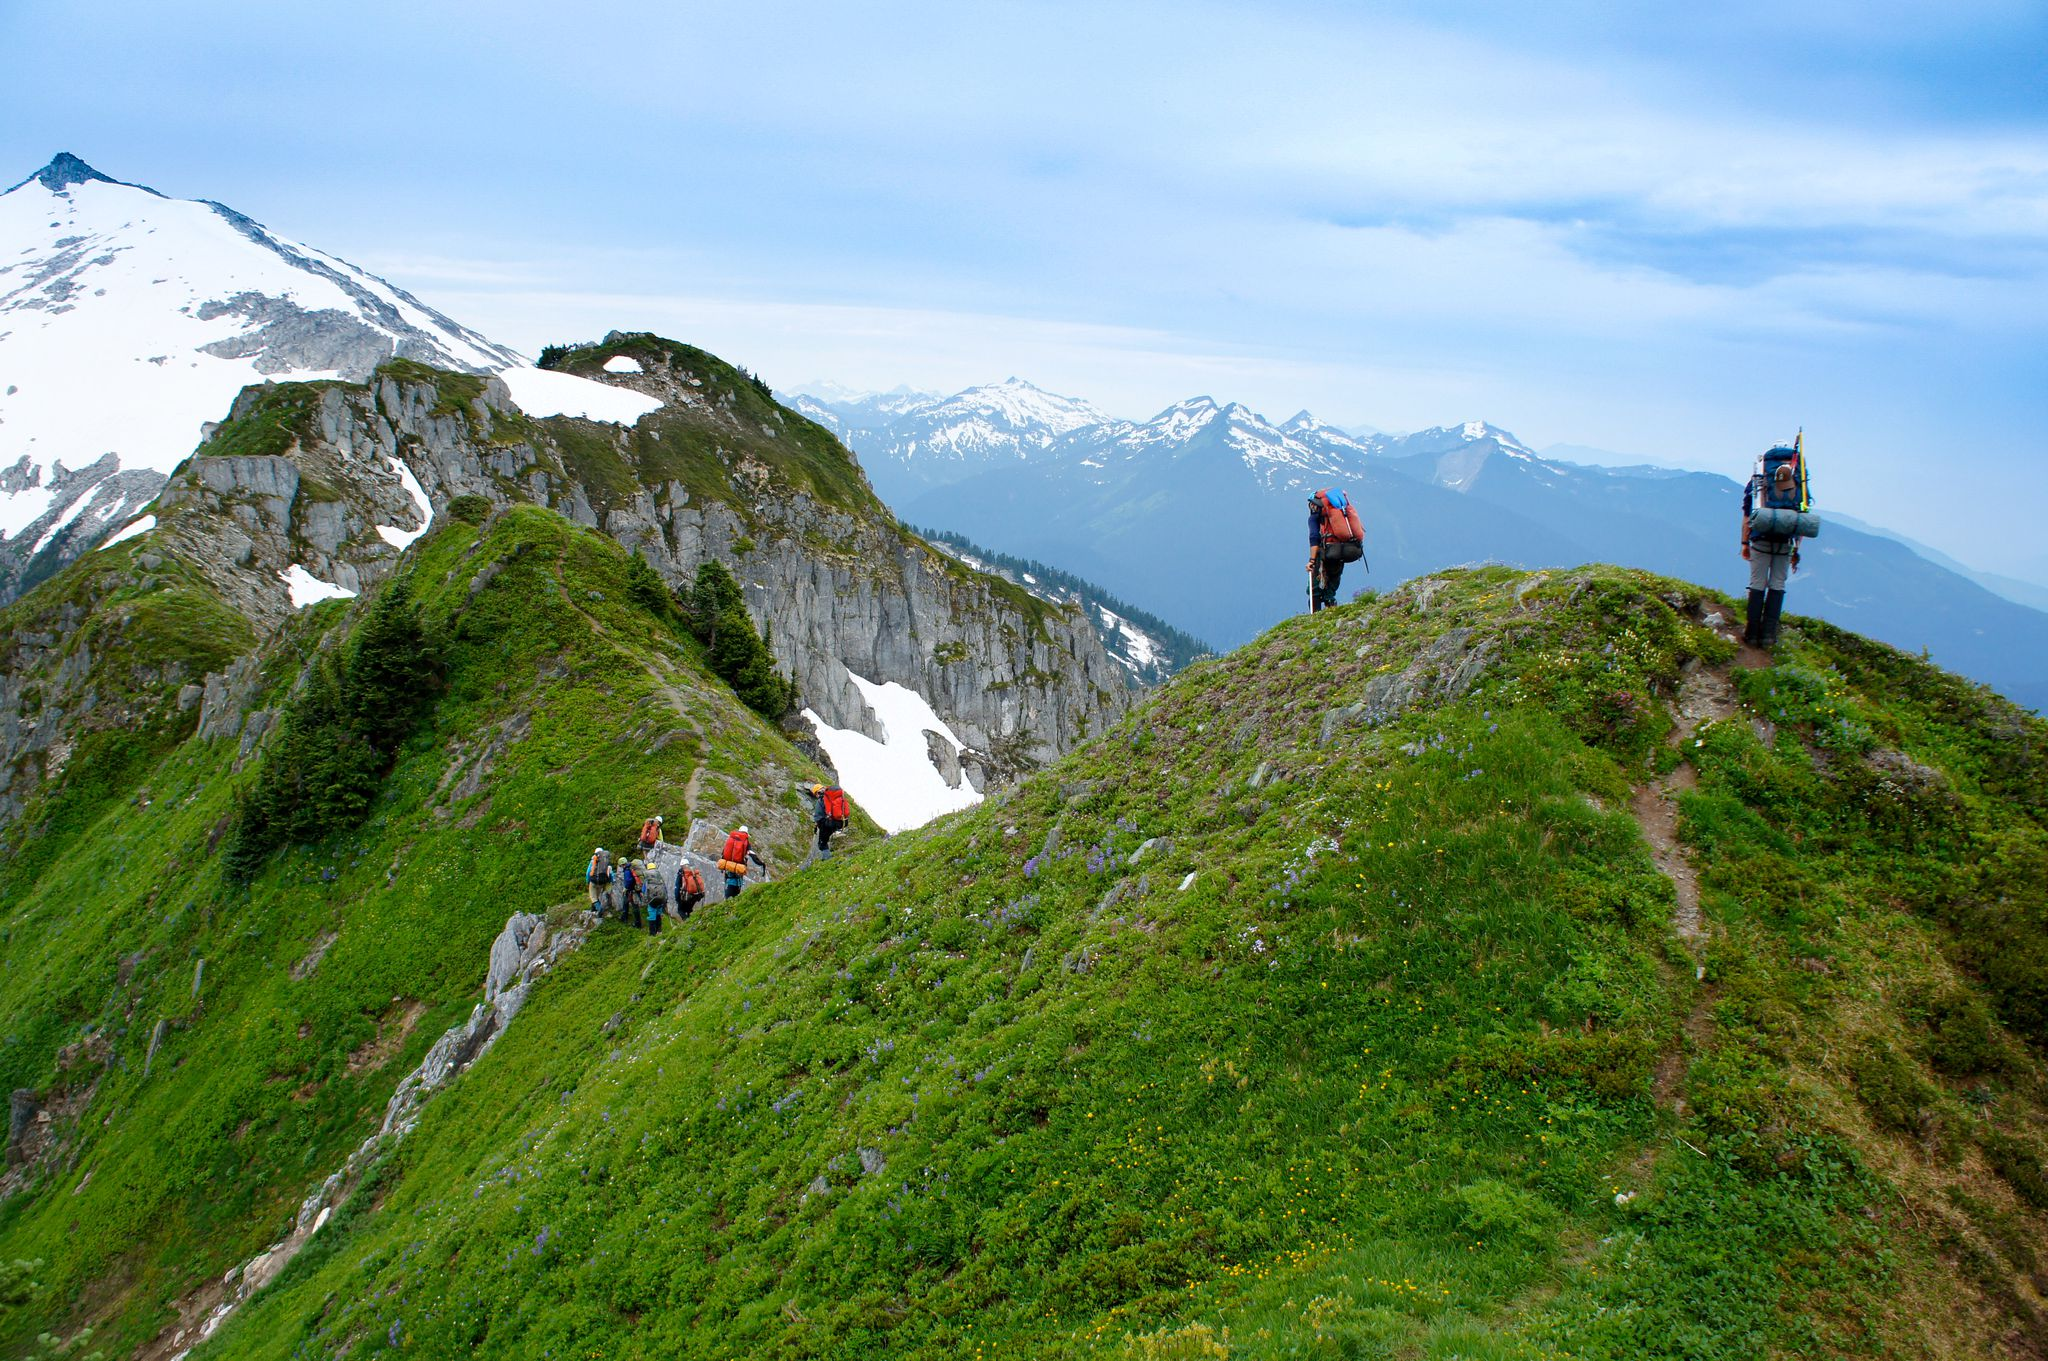 Gap Year Program - NOLS Study Abroad Outdoors  1